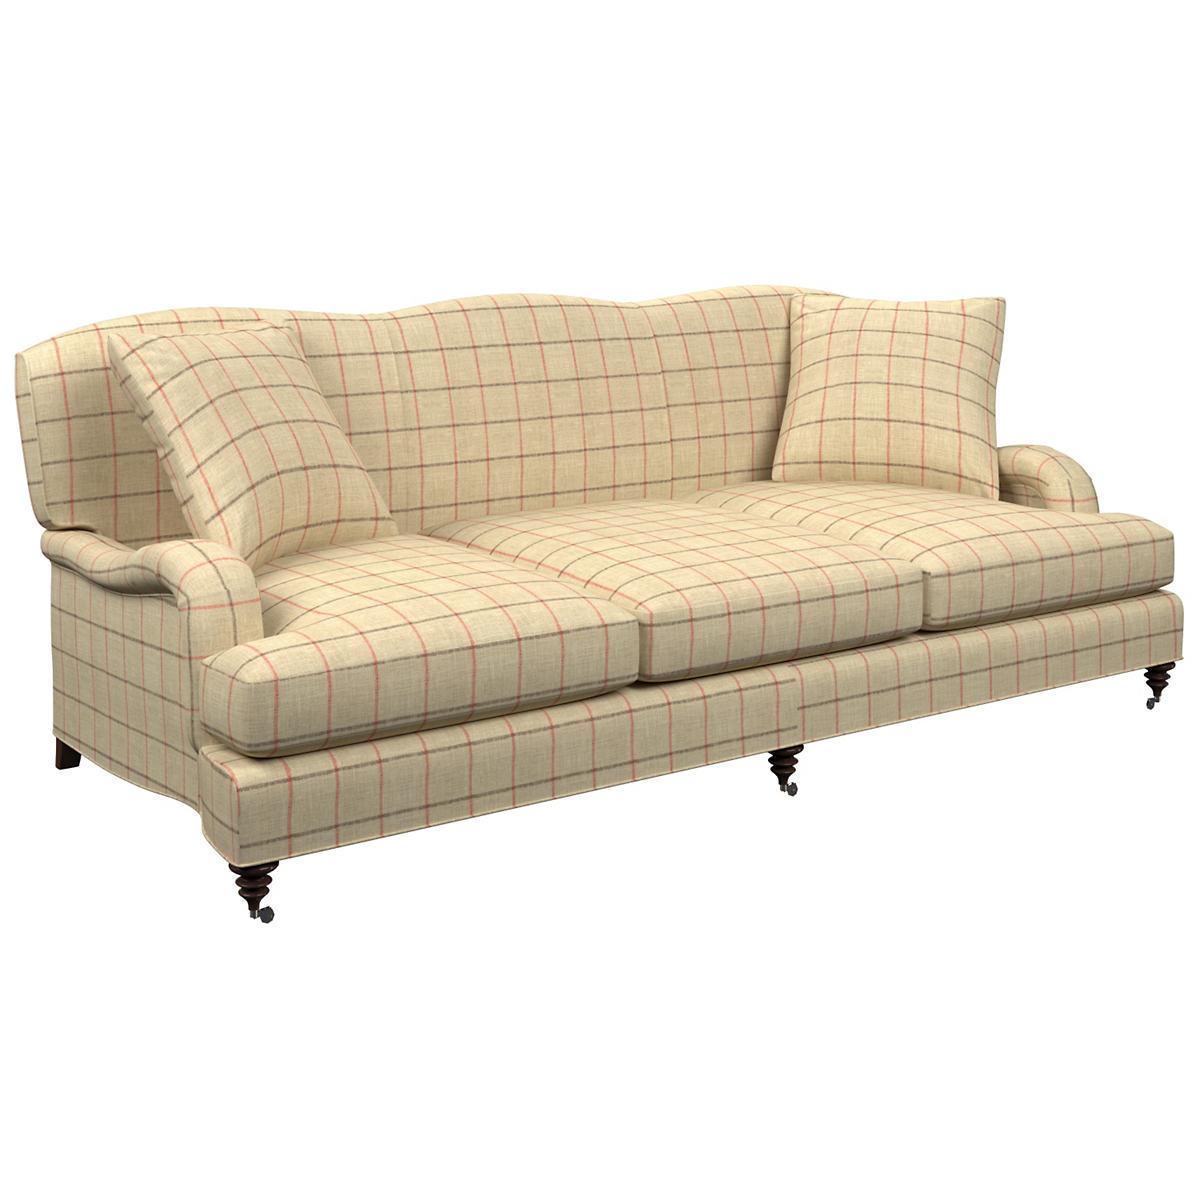 Chatham Tattersall Brick/Brown Litchfield 3 Seater Sofa